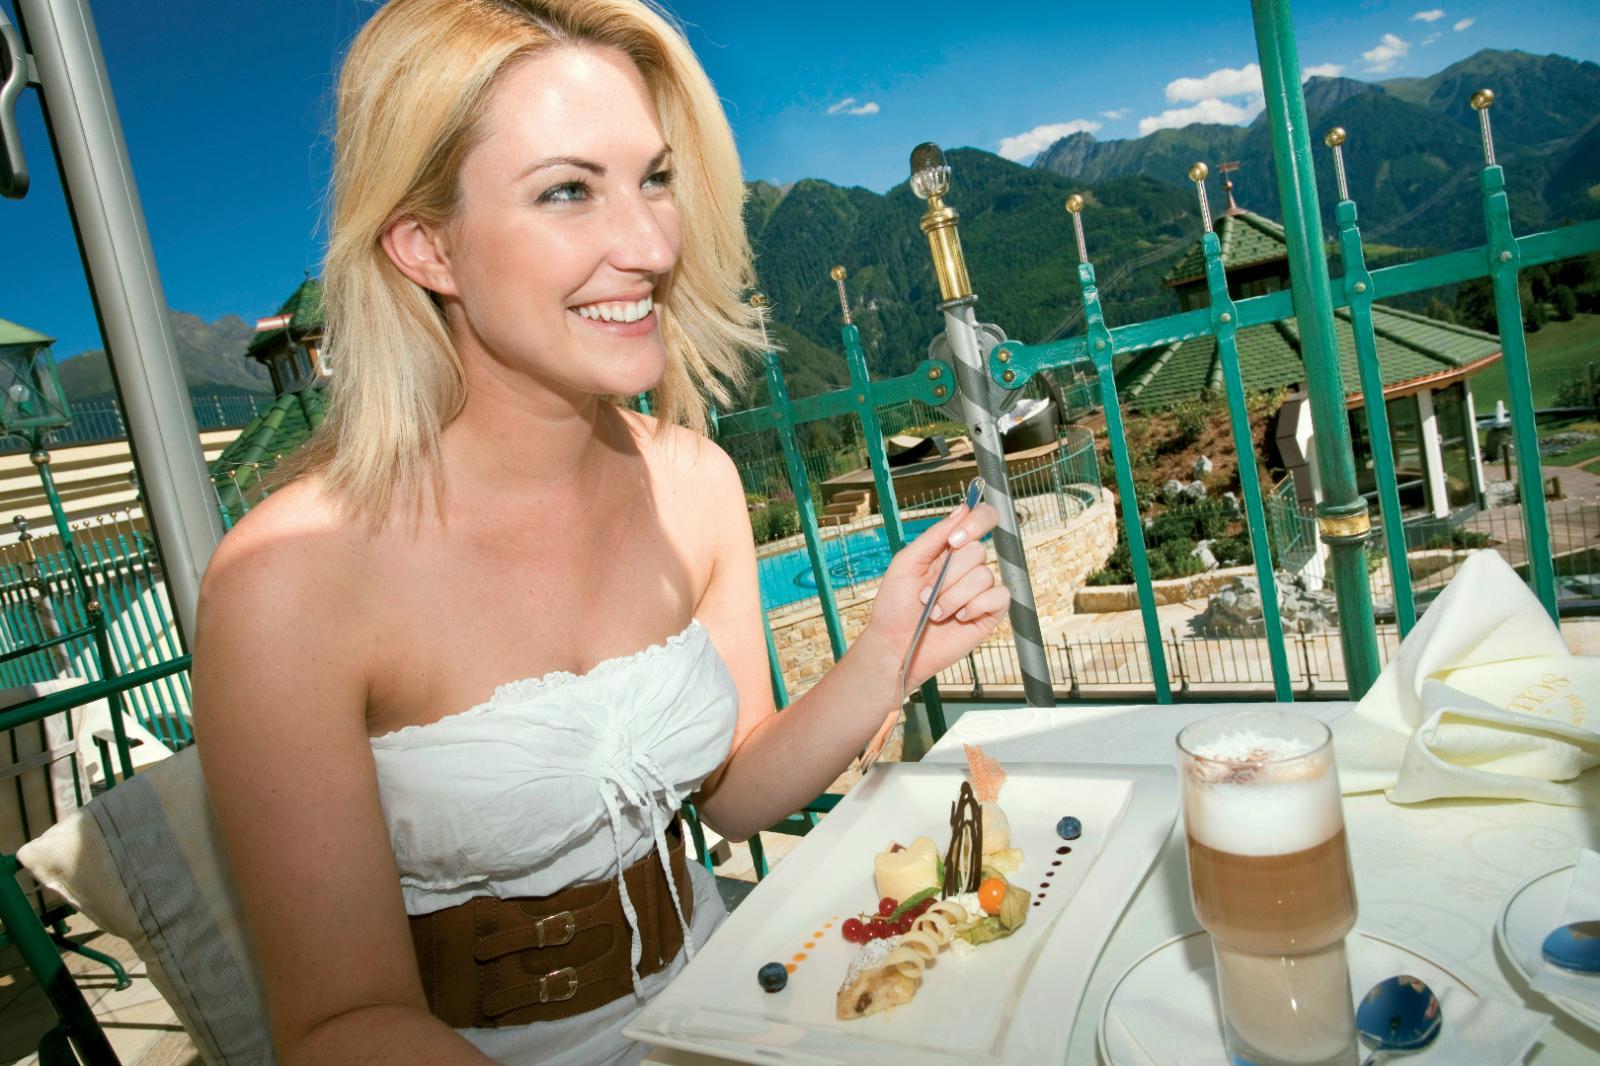 Ohrakupunktur: Foto vom Wellnesshotel Wellness-Residenz Schalber   Wellness Tirol